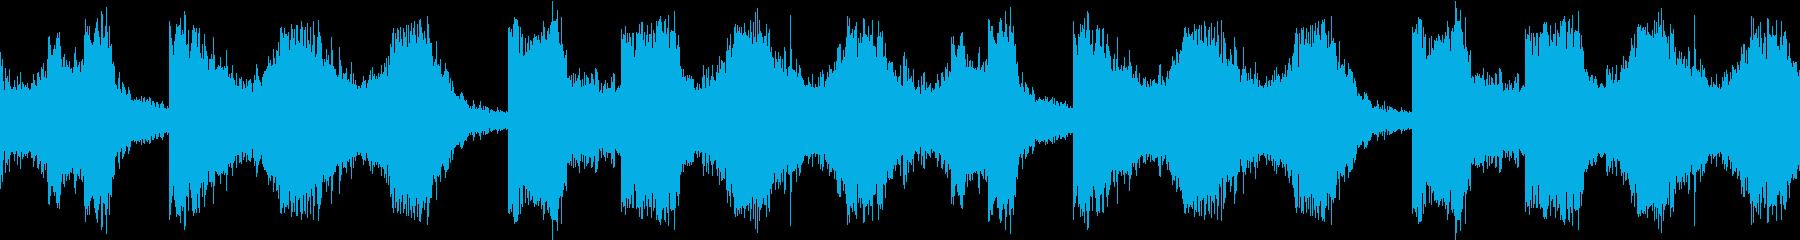 EDM リードシンセ 6 音楽制作用の再生済みの波形